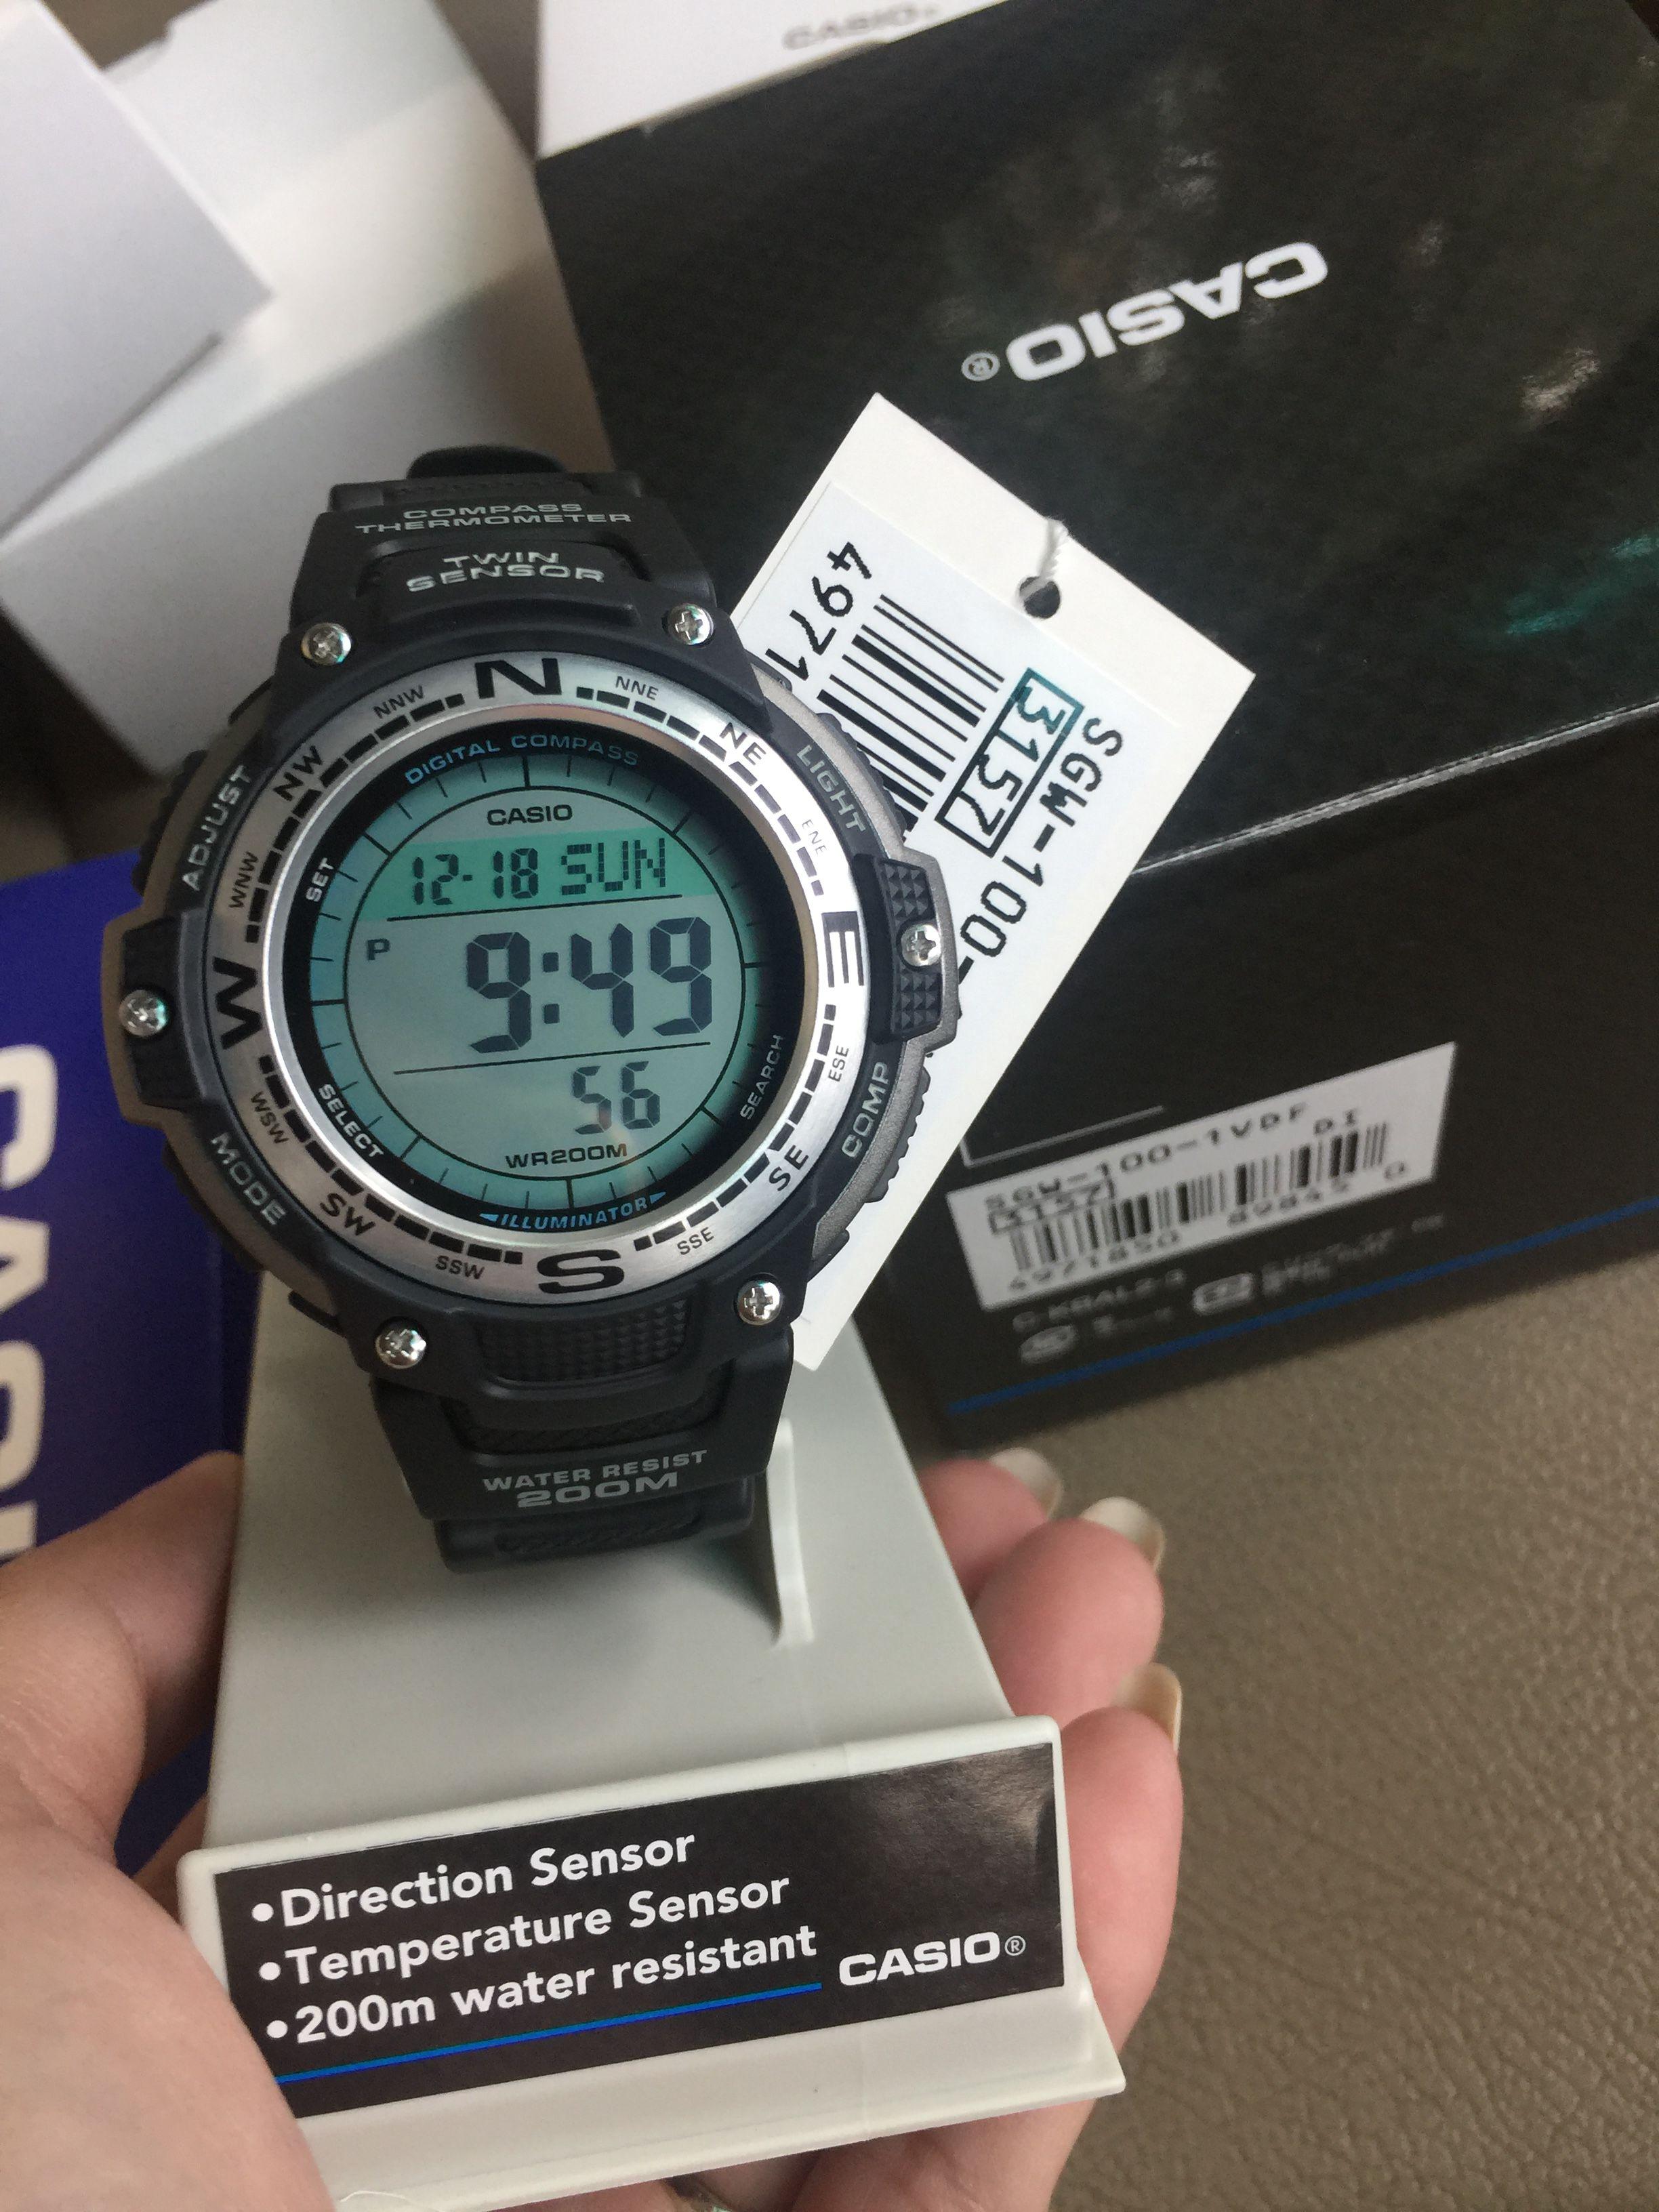 30ac5ffb831 นาฬิกาข้อมือ Casio Outgear รุ่น SGW-100-1VDR นาฬิกาข้อมือสำหรับผู้ชาย